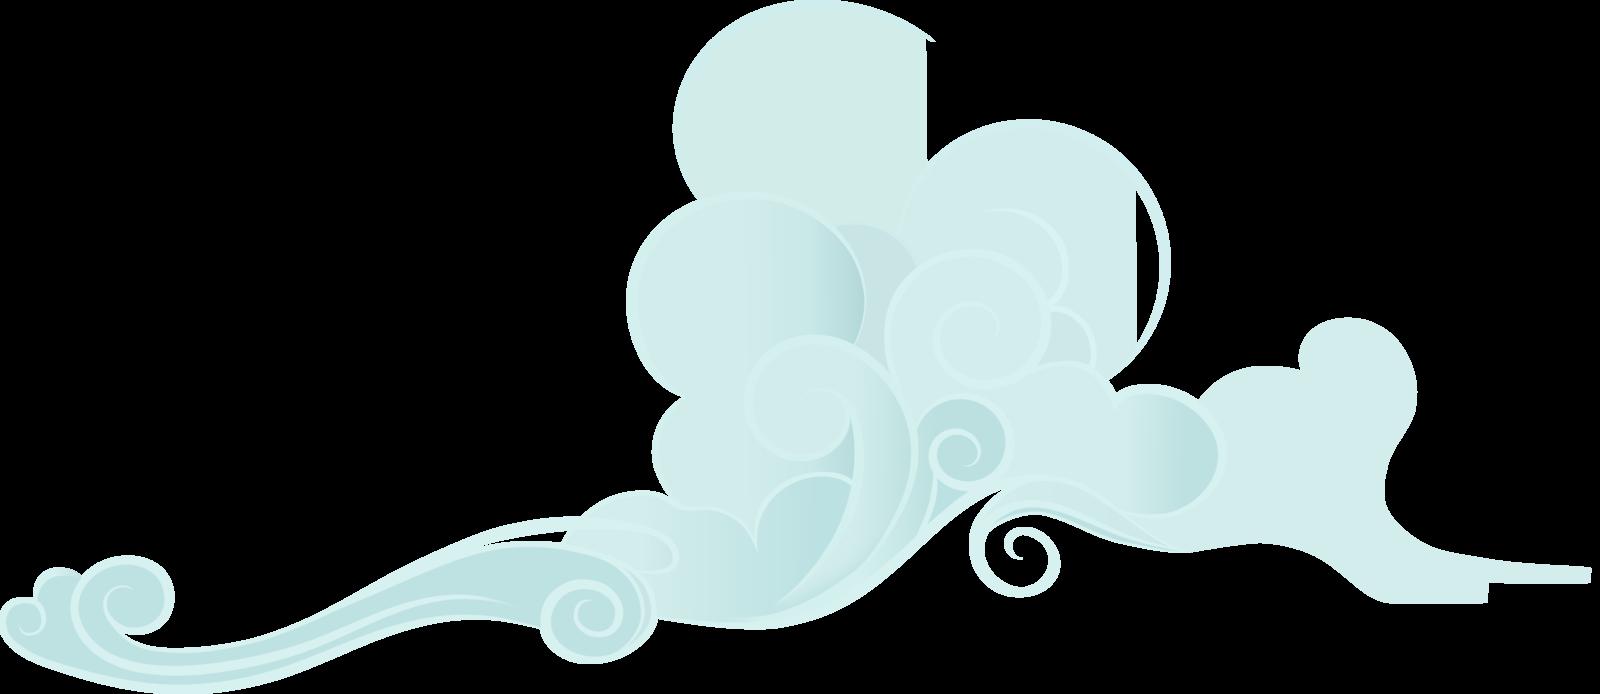 Hurricane clipart wind element. A nice fluffy cloud